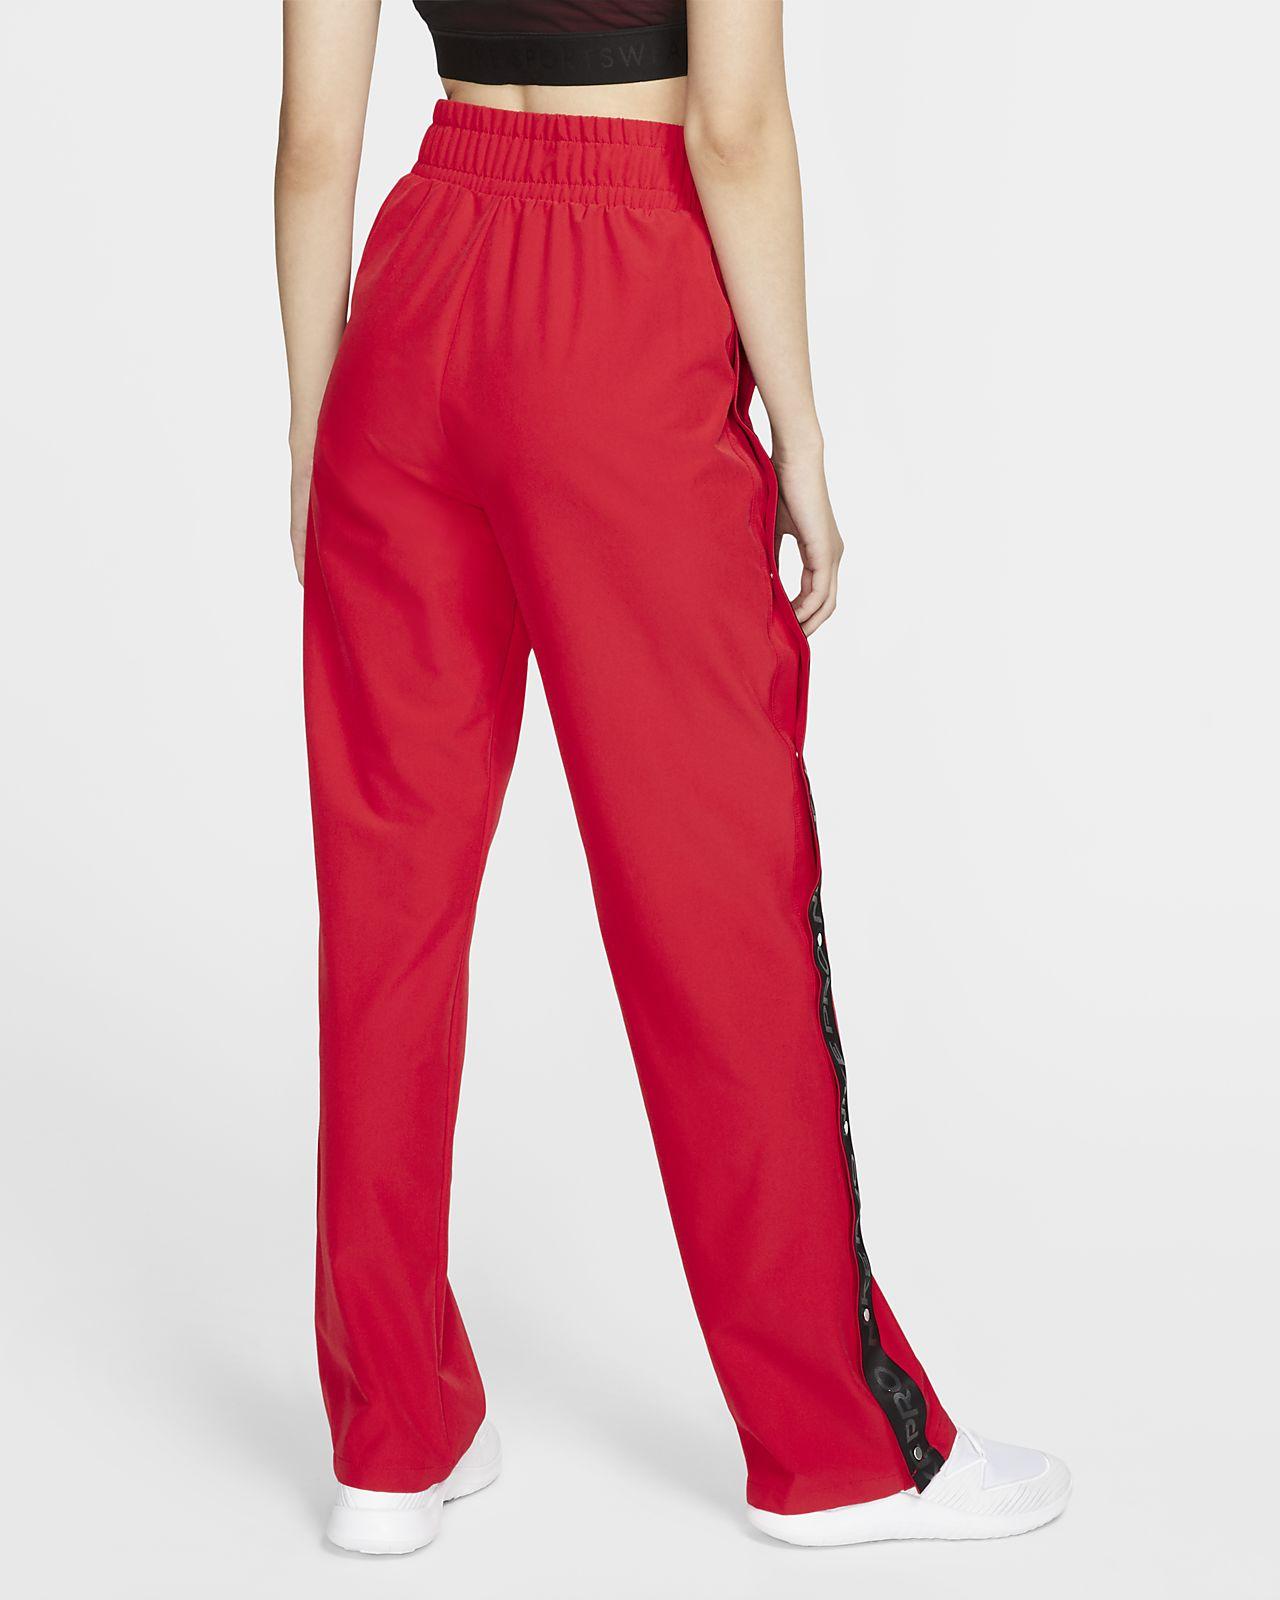 Pantalon Nike Mujer Con Botones Baratas Online